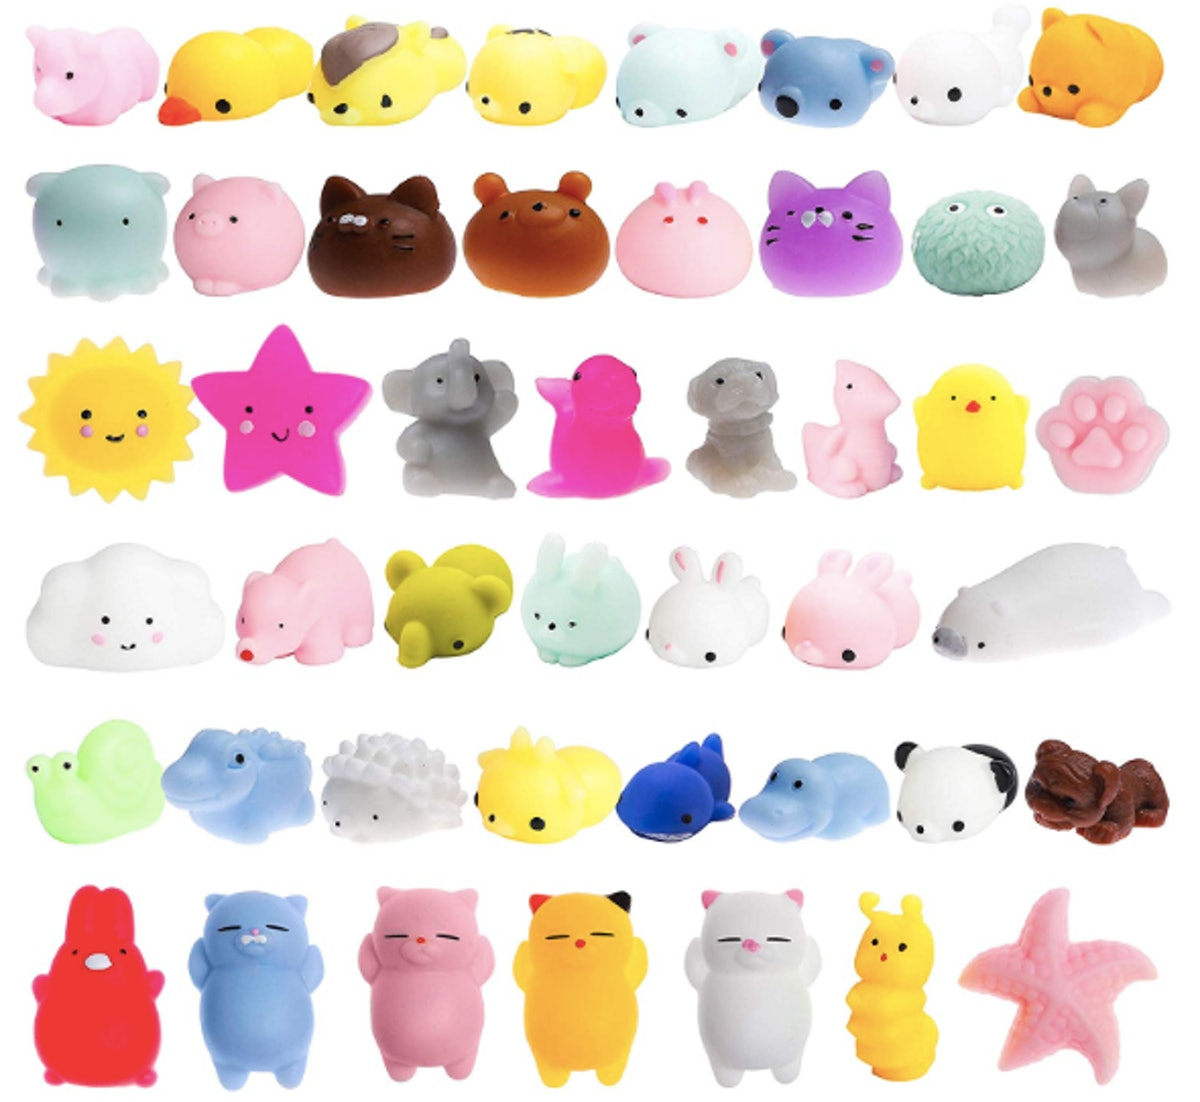 WATINC 40-Piece Mochi Squishies Stress Relief Toys